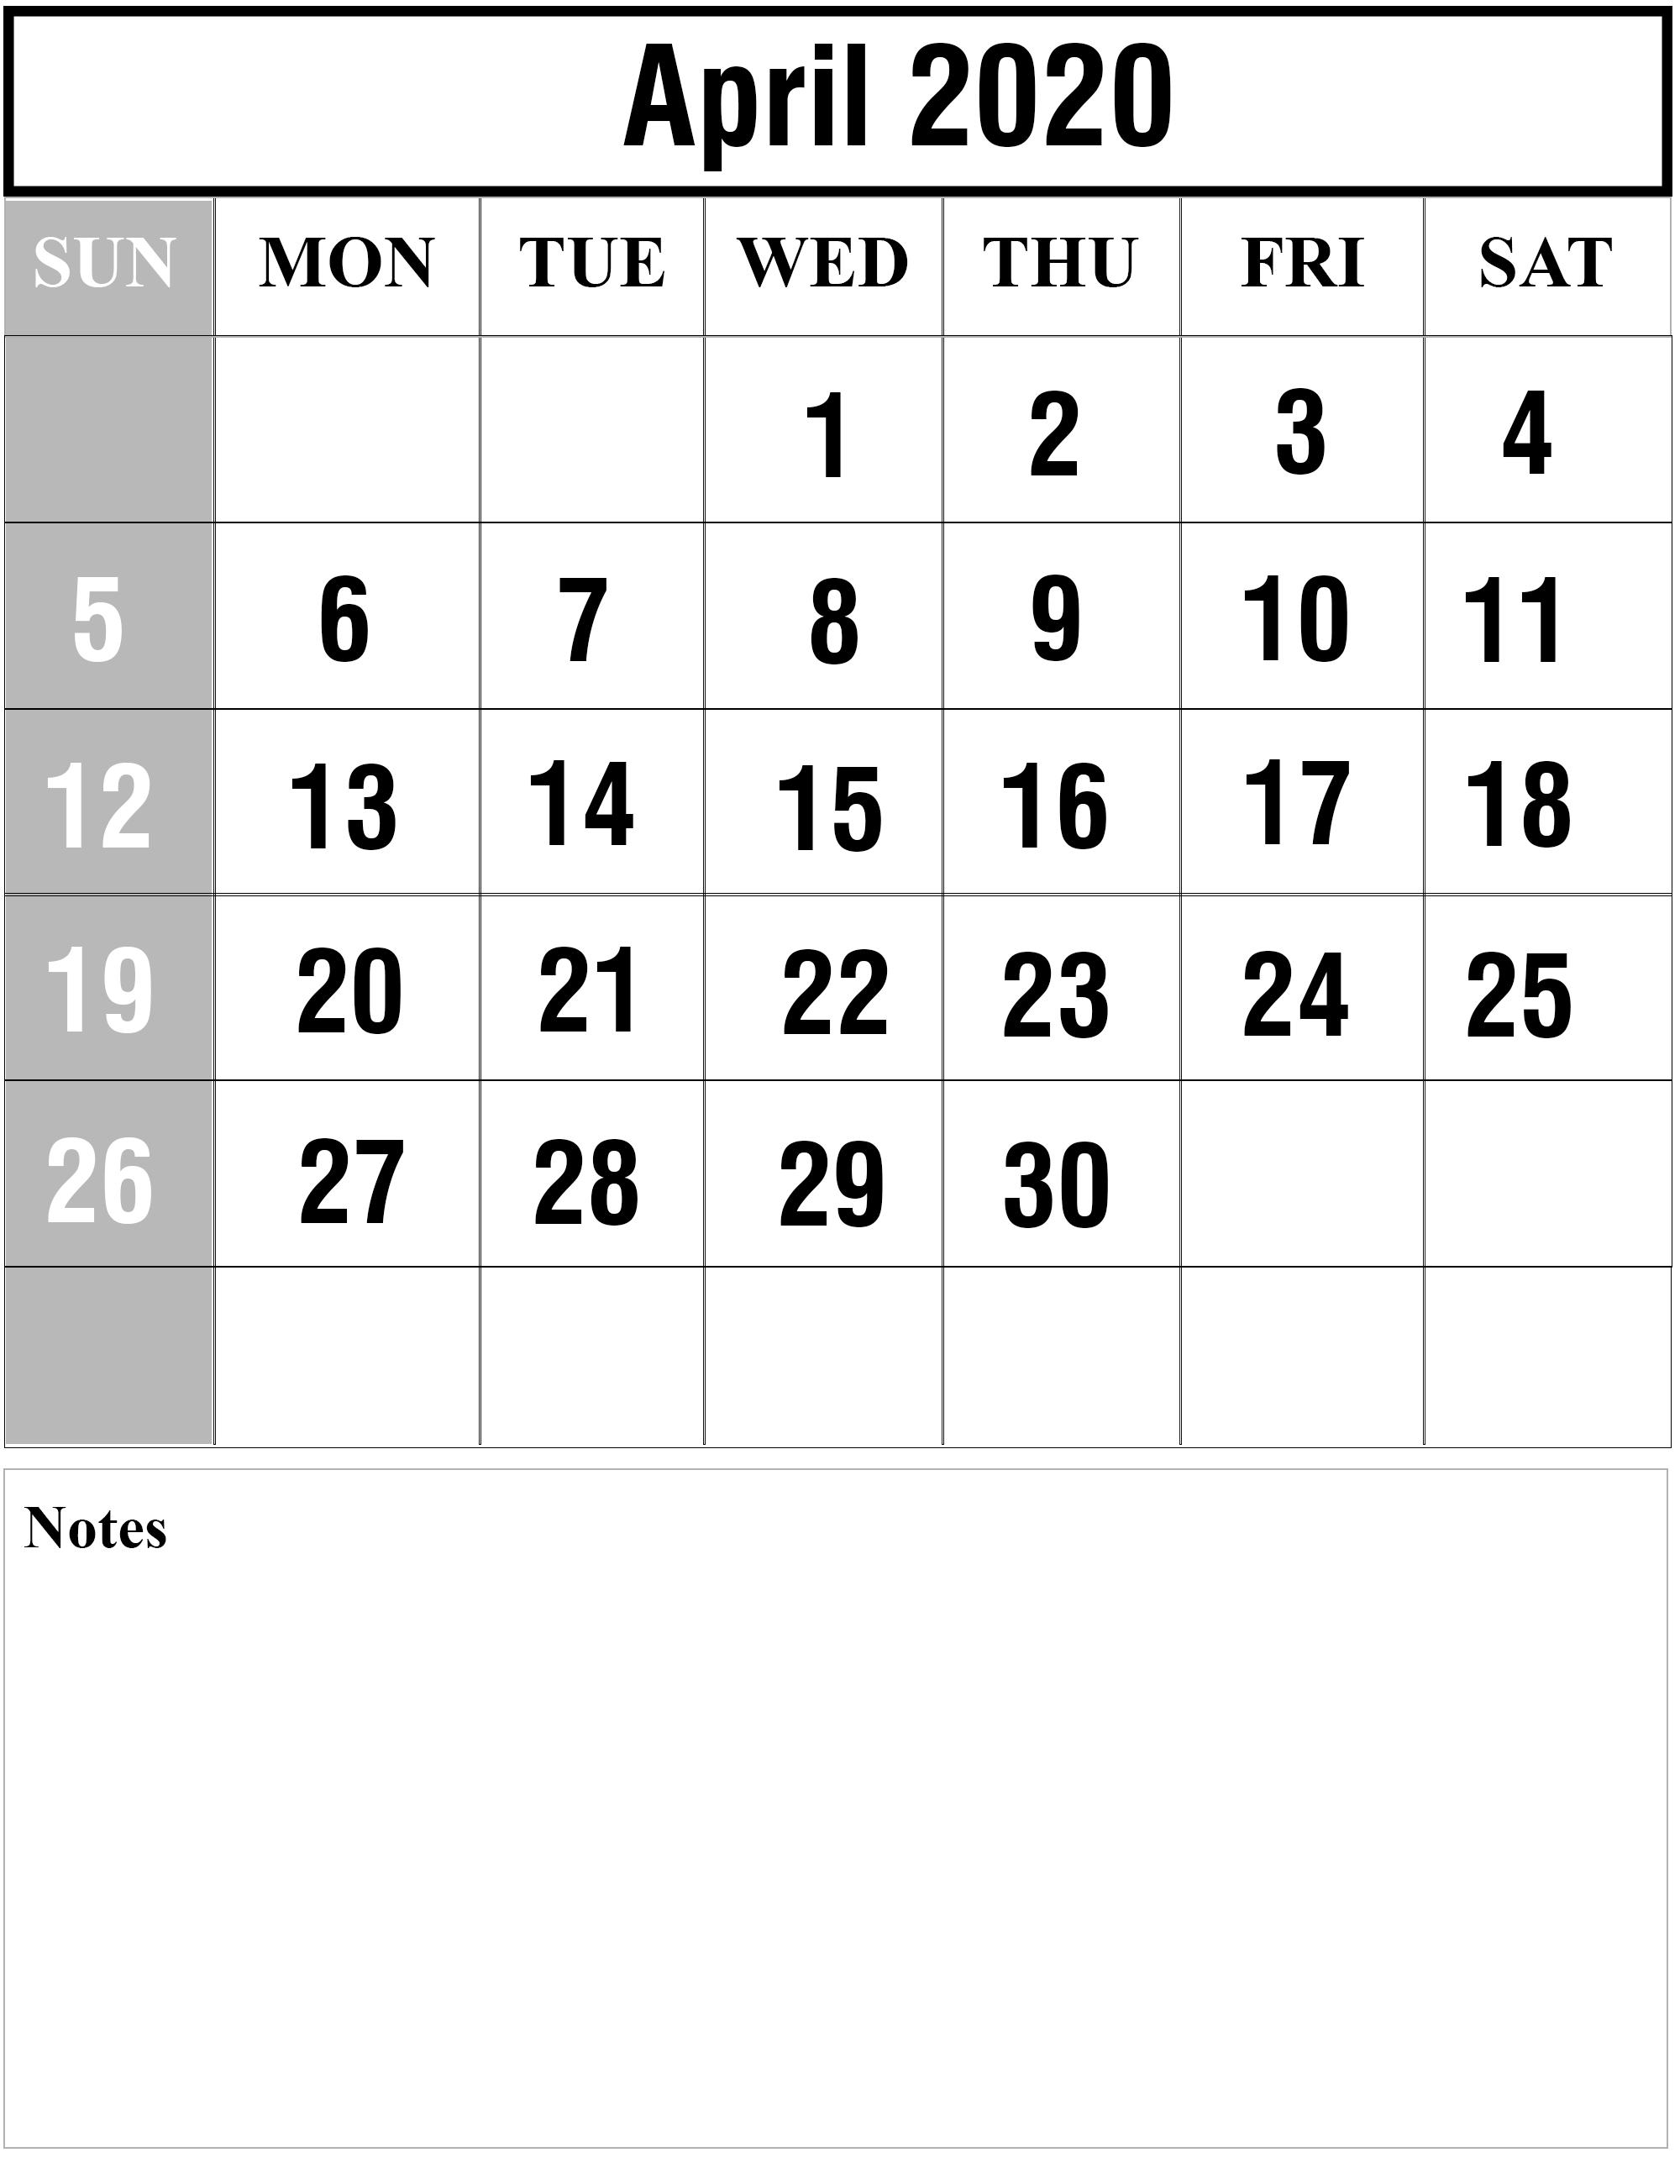 Free Blank April 2020 Printable Calendar [Pdf, Excel & Word